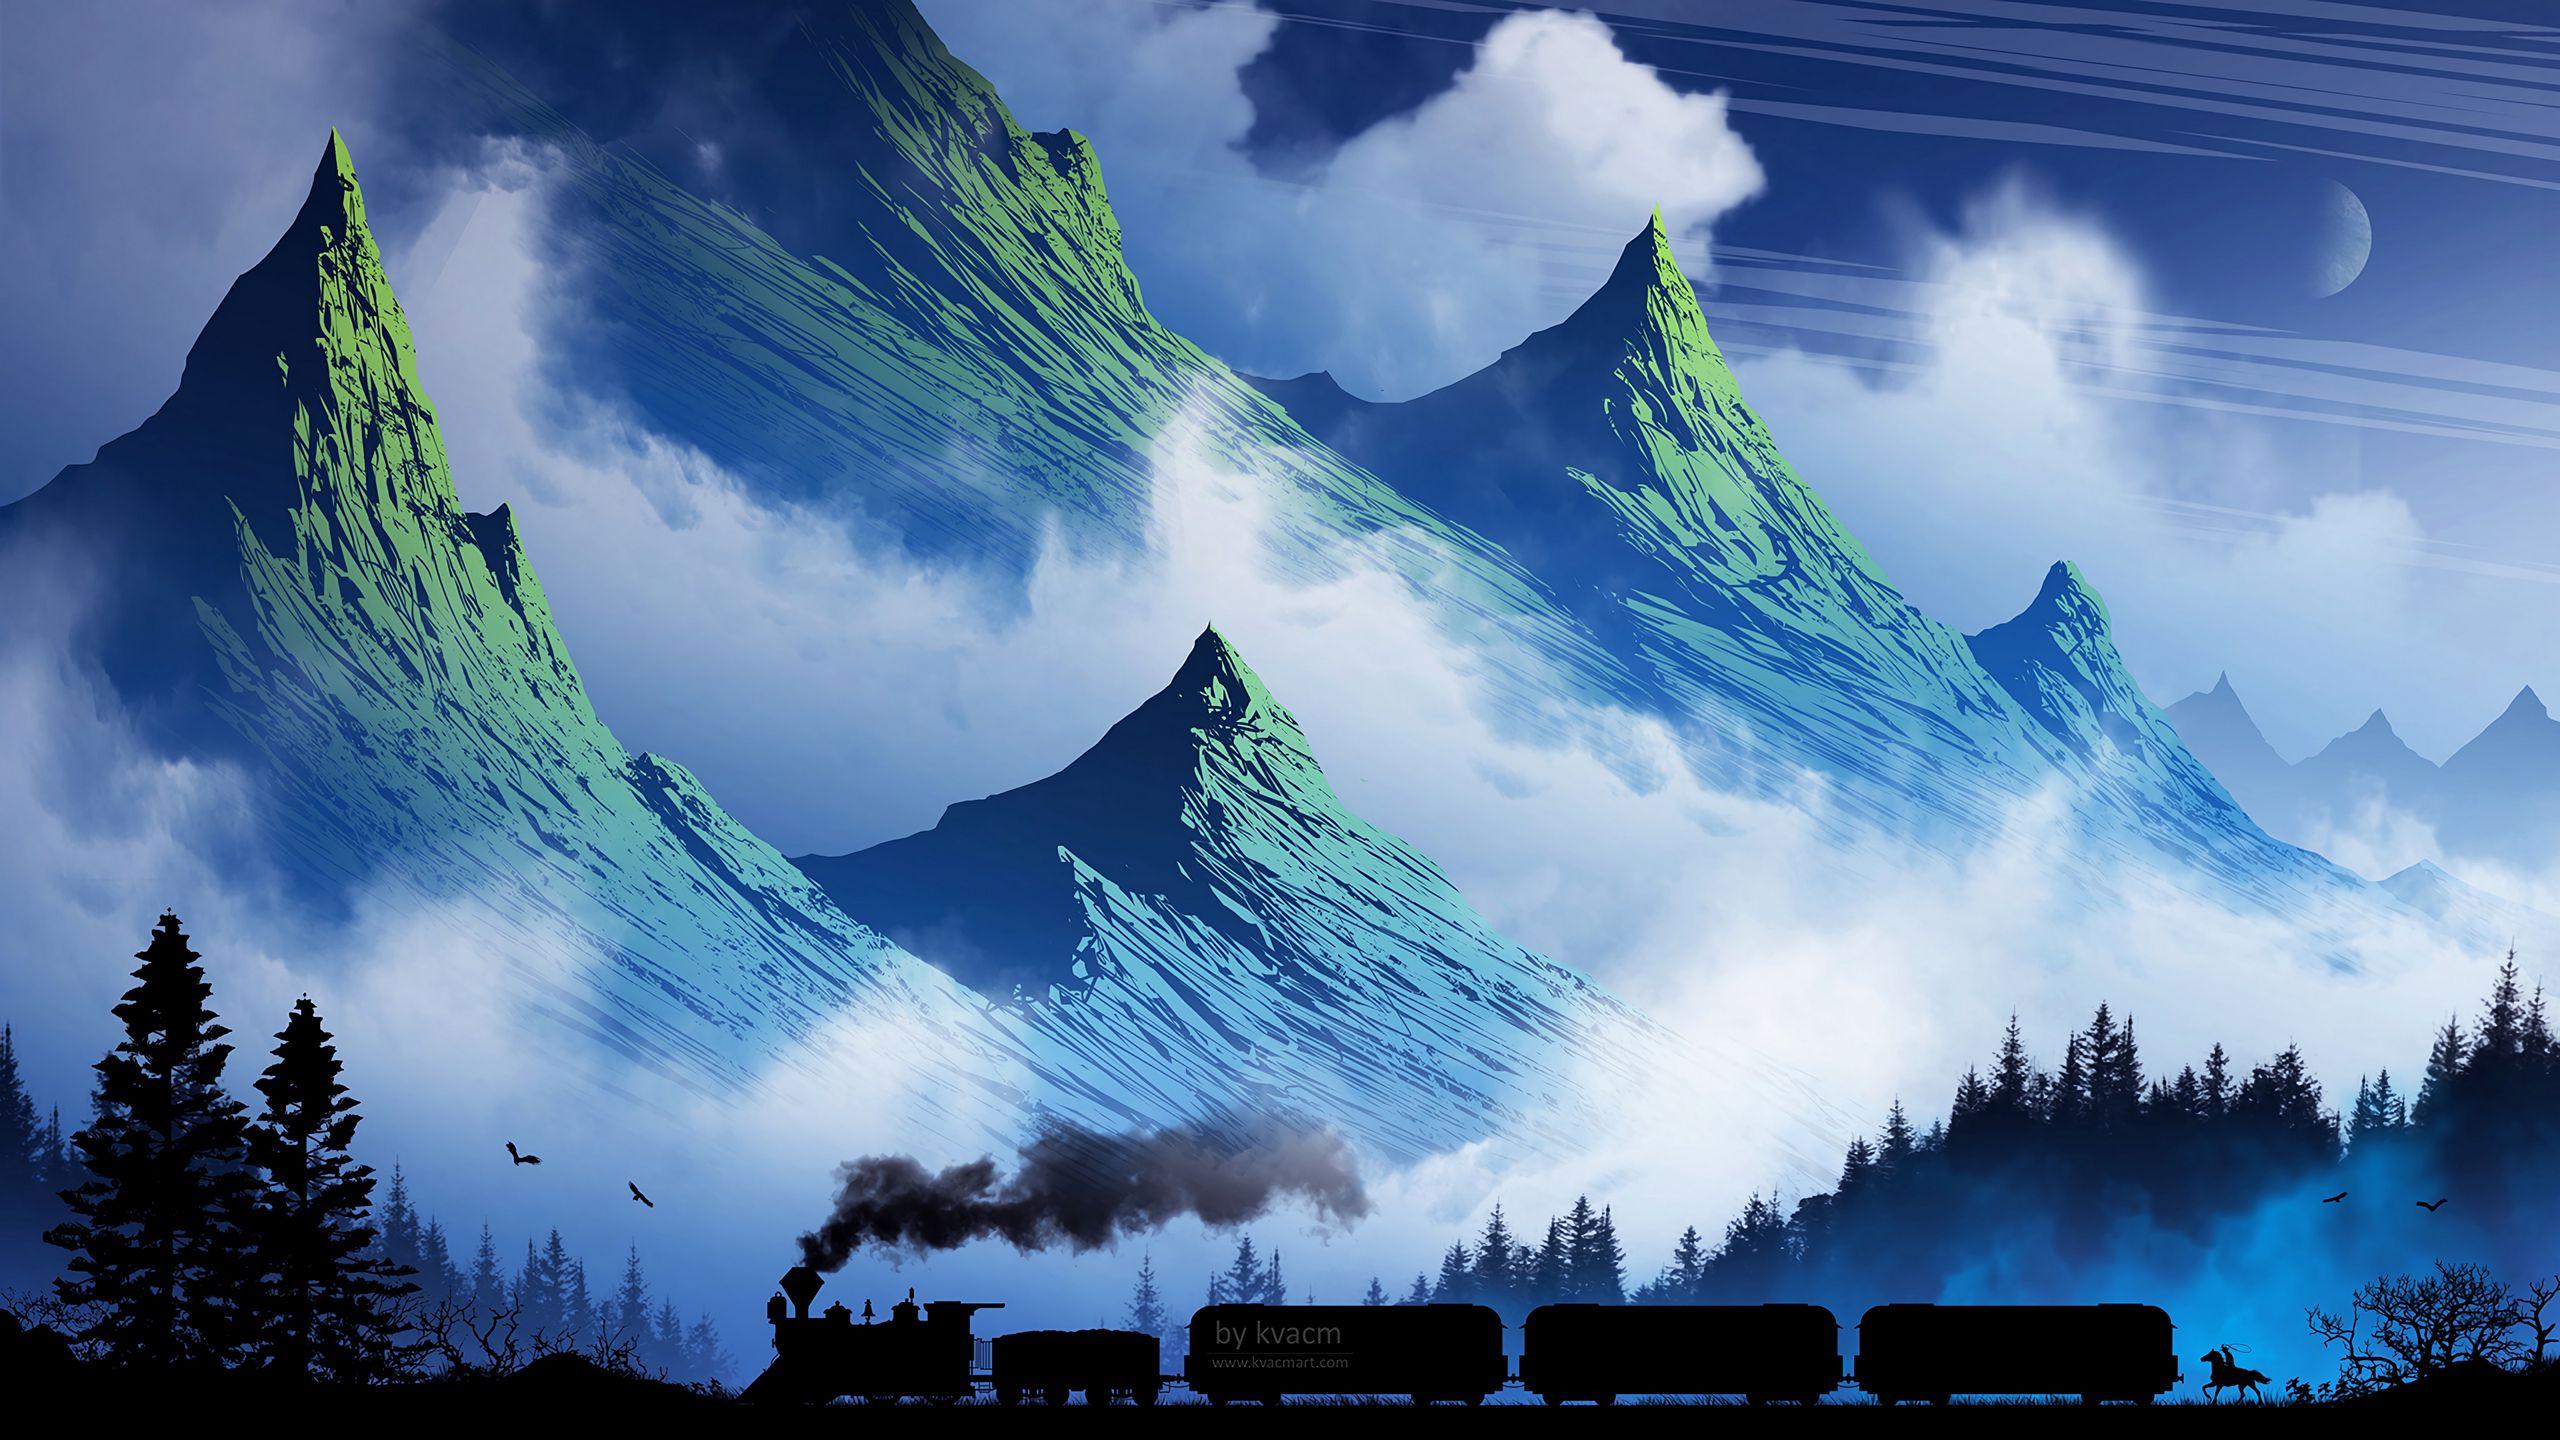 2560x1440 Wallpaper train, mountains, art, fog, smoke